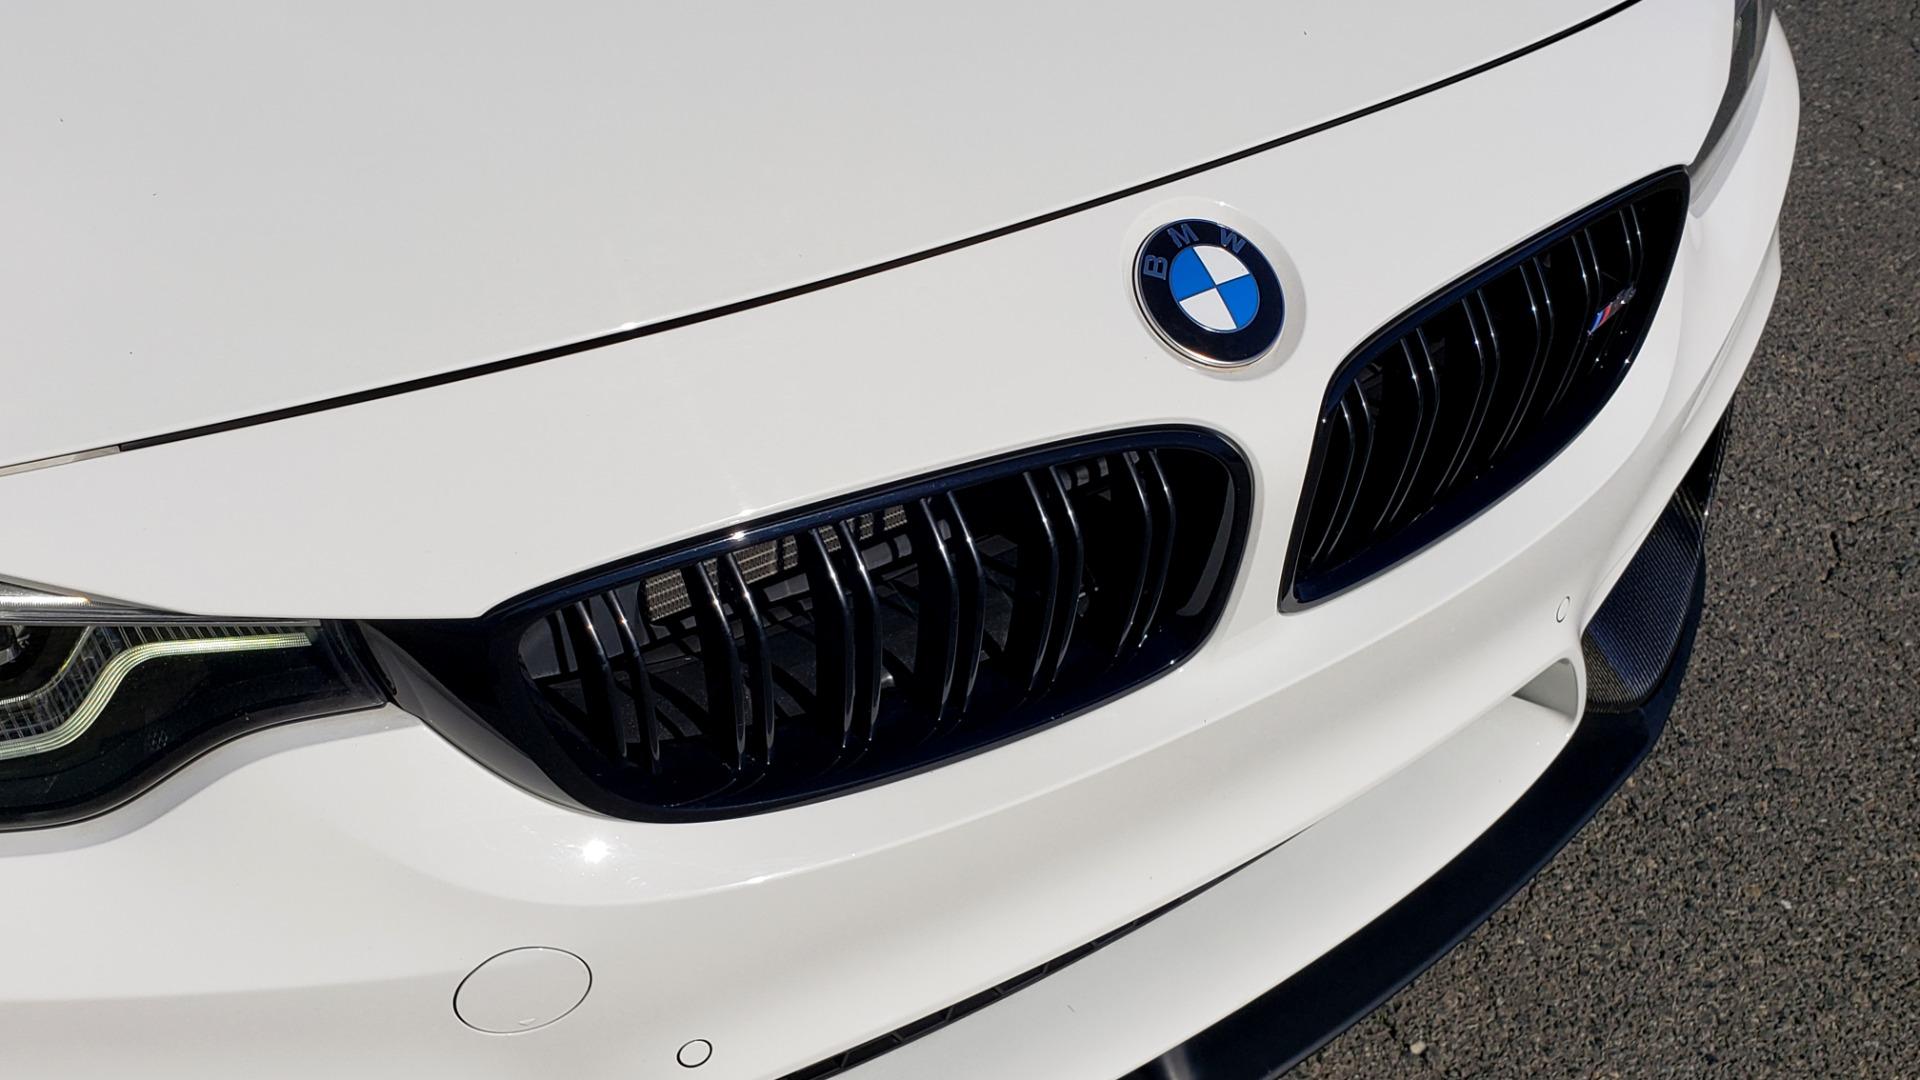 Used 2018 BMW M4 COMP PKG / EXEC / M-DRIVER / PARK CNTRL / ACTIVE BLIND SPOT for sale $45,449 at Formula Imports in Charlotte NC 28227 11